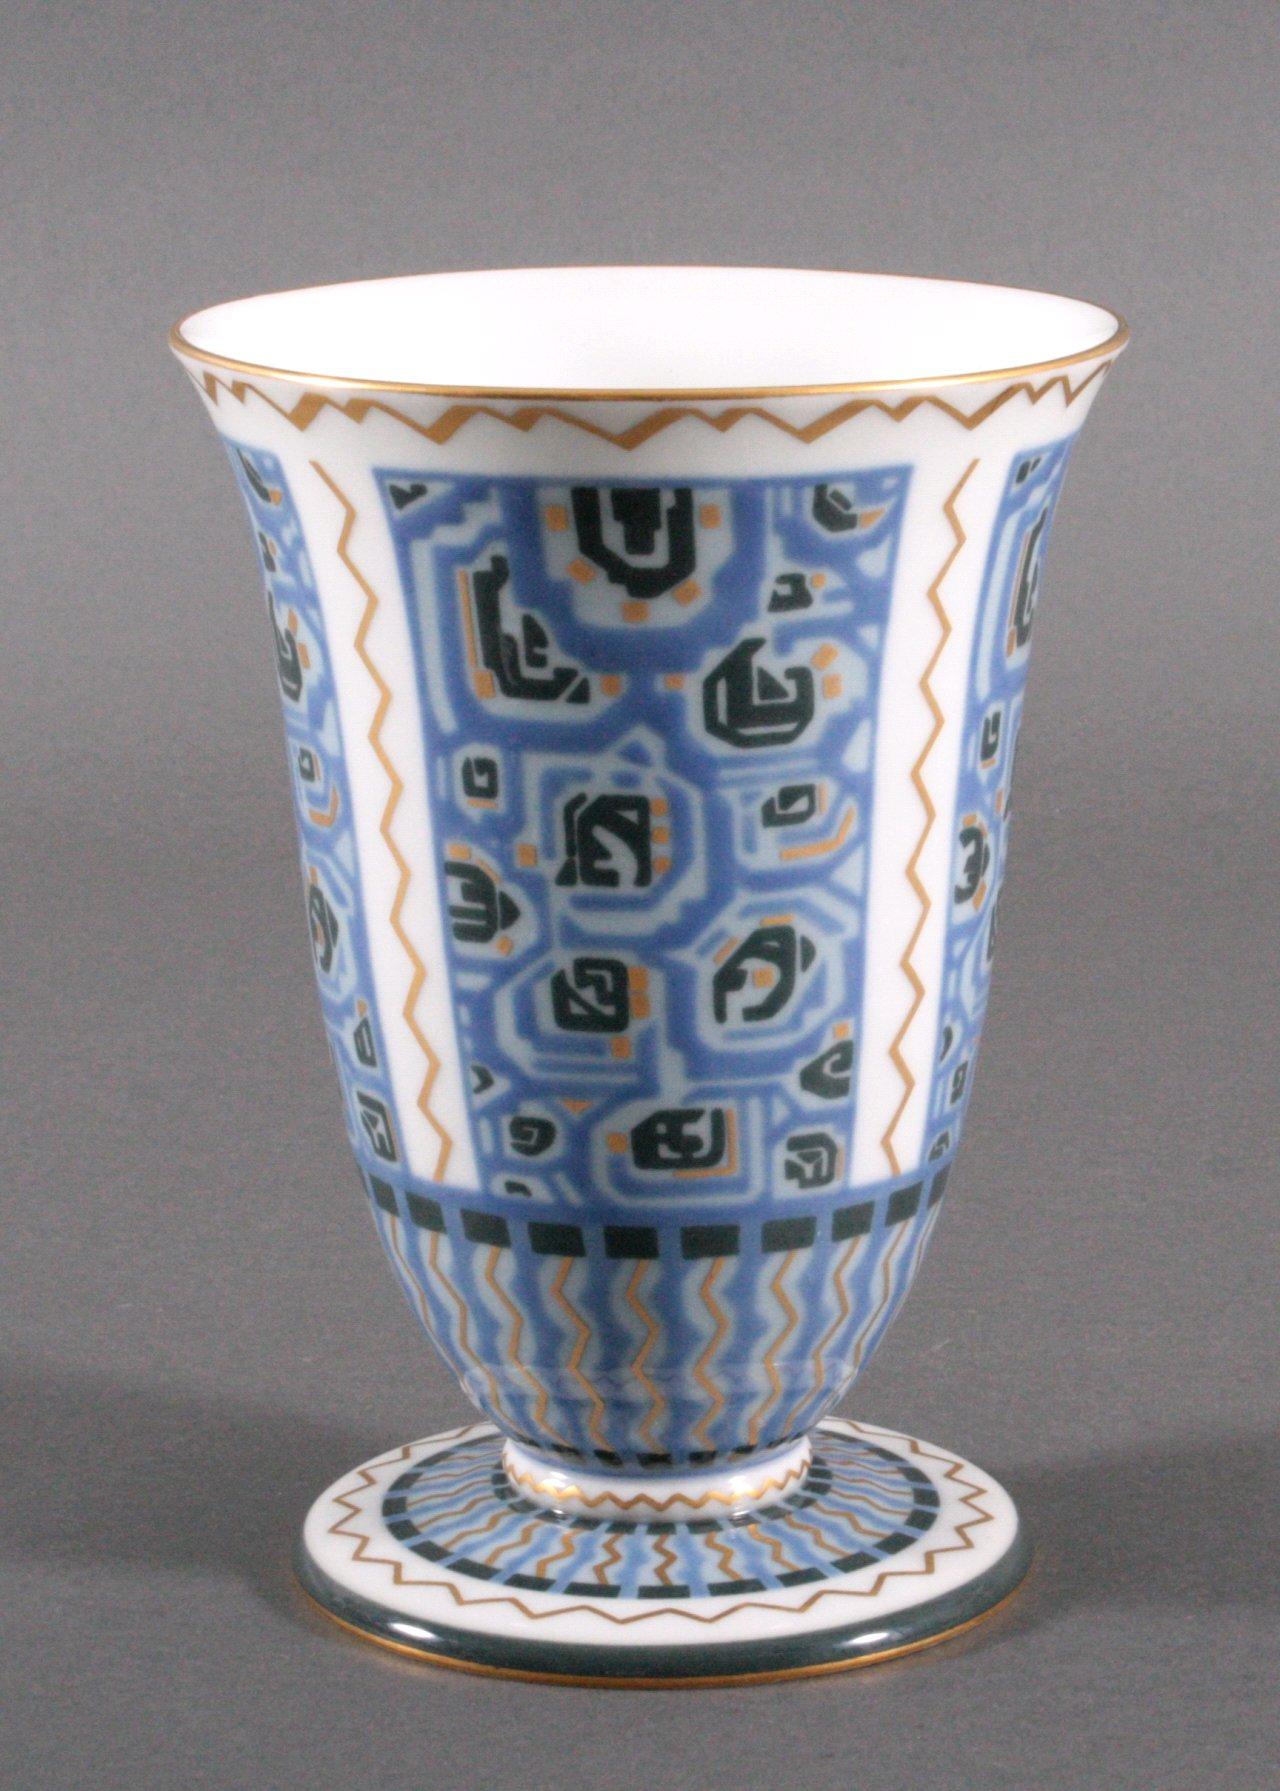 Vase, Herbillon, Sèvres